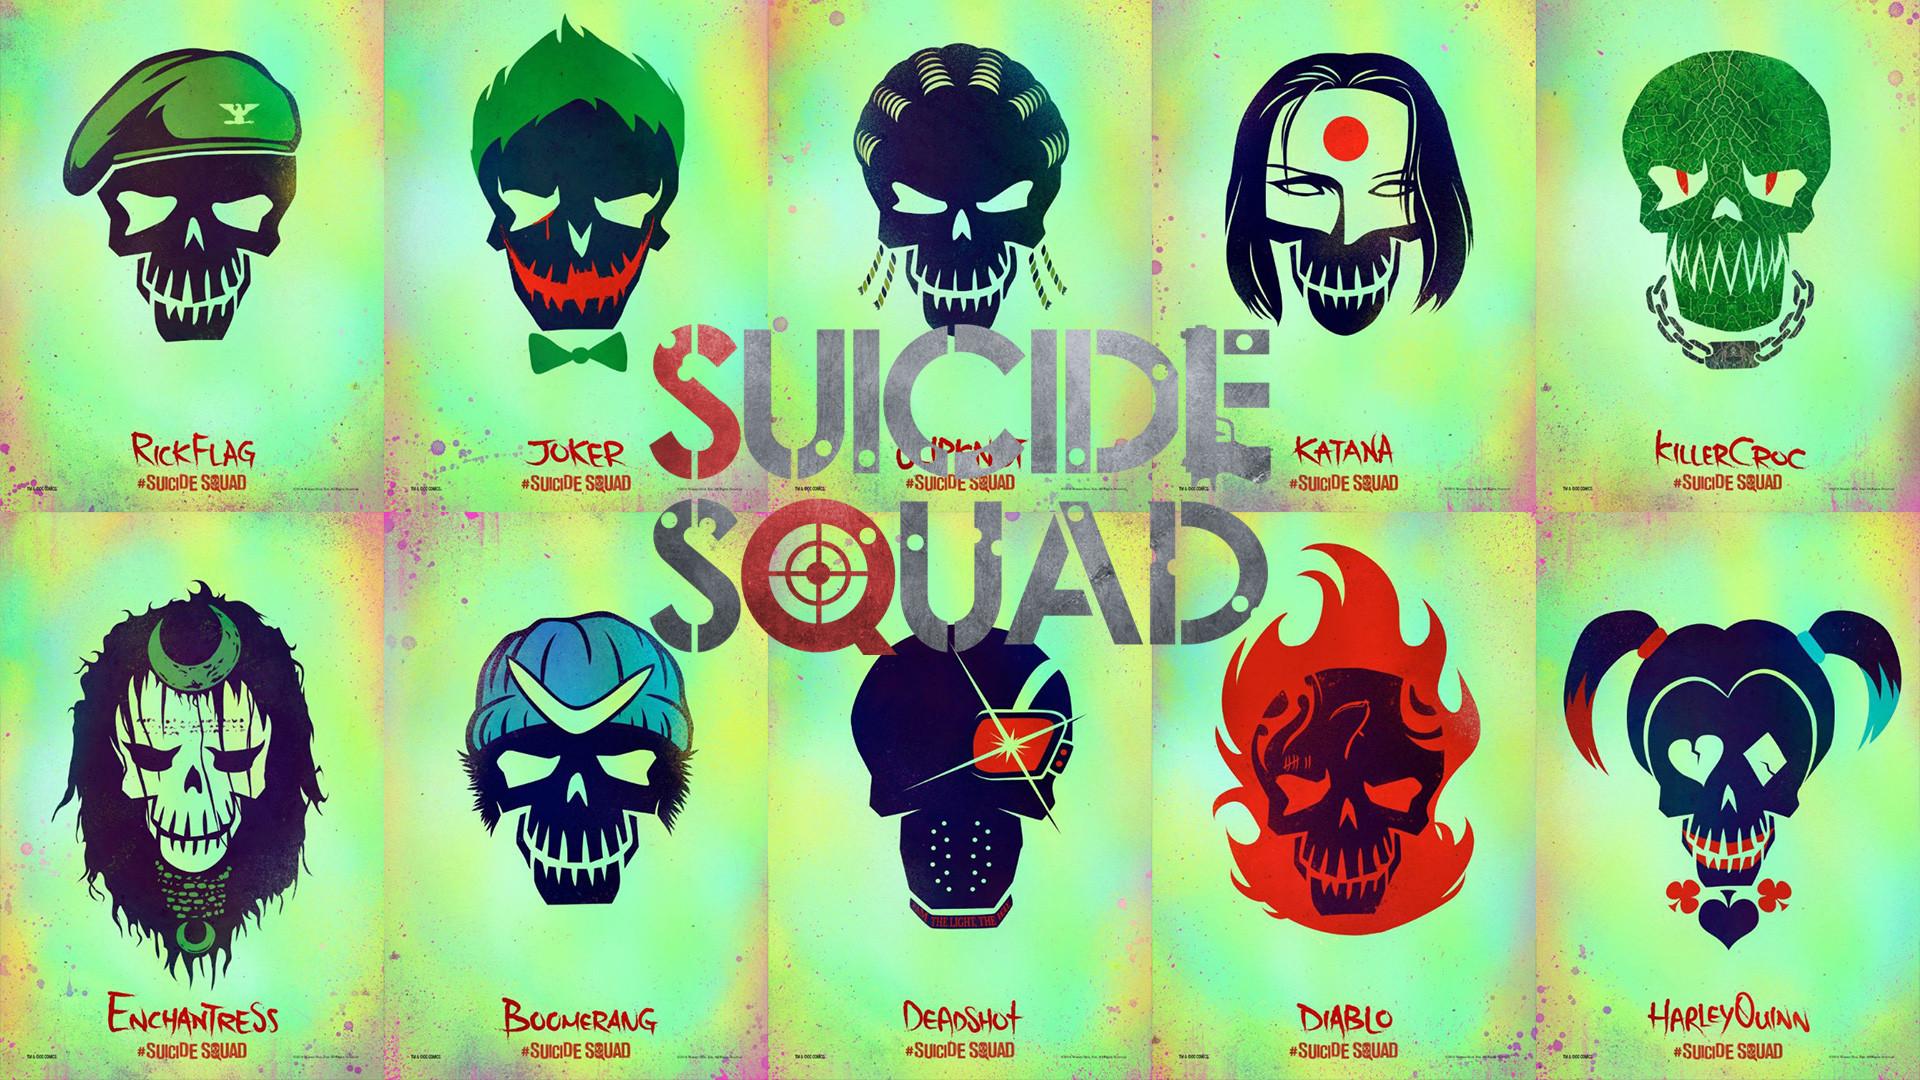 Suicide Squad Wallpaper 20   1920 X 1080 stmednet 1920x1080